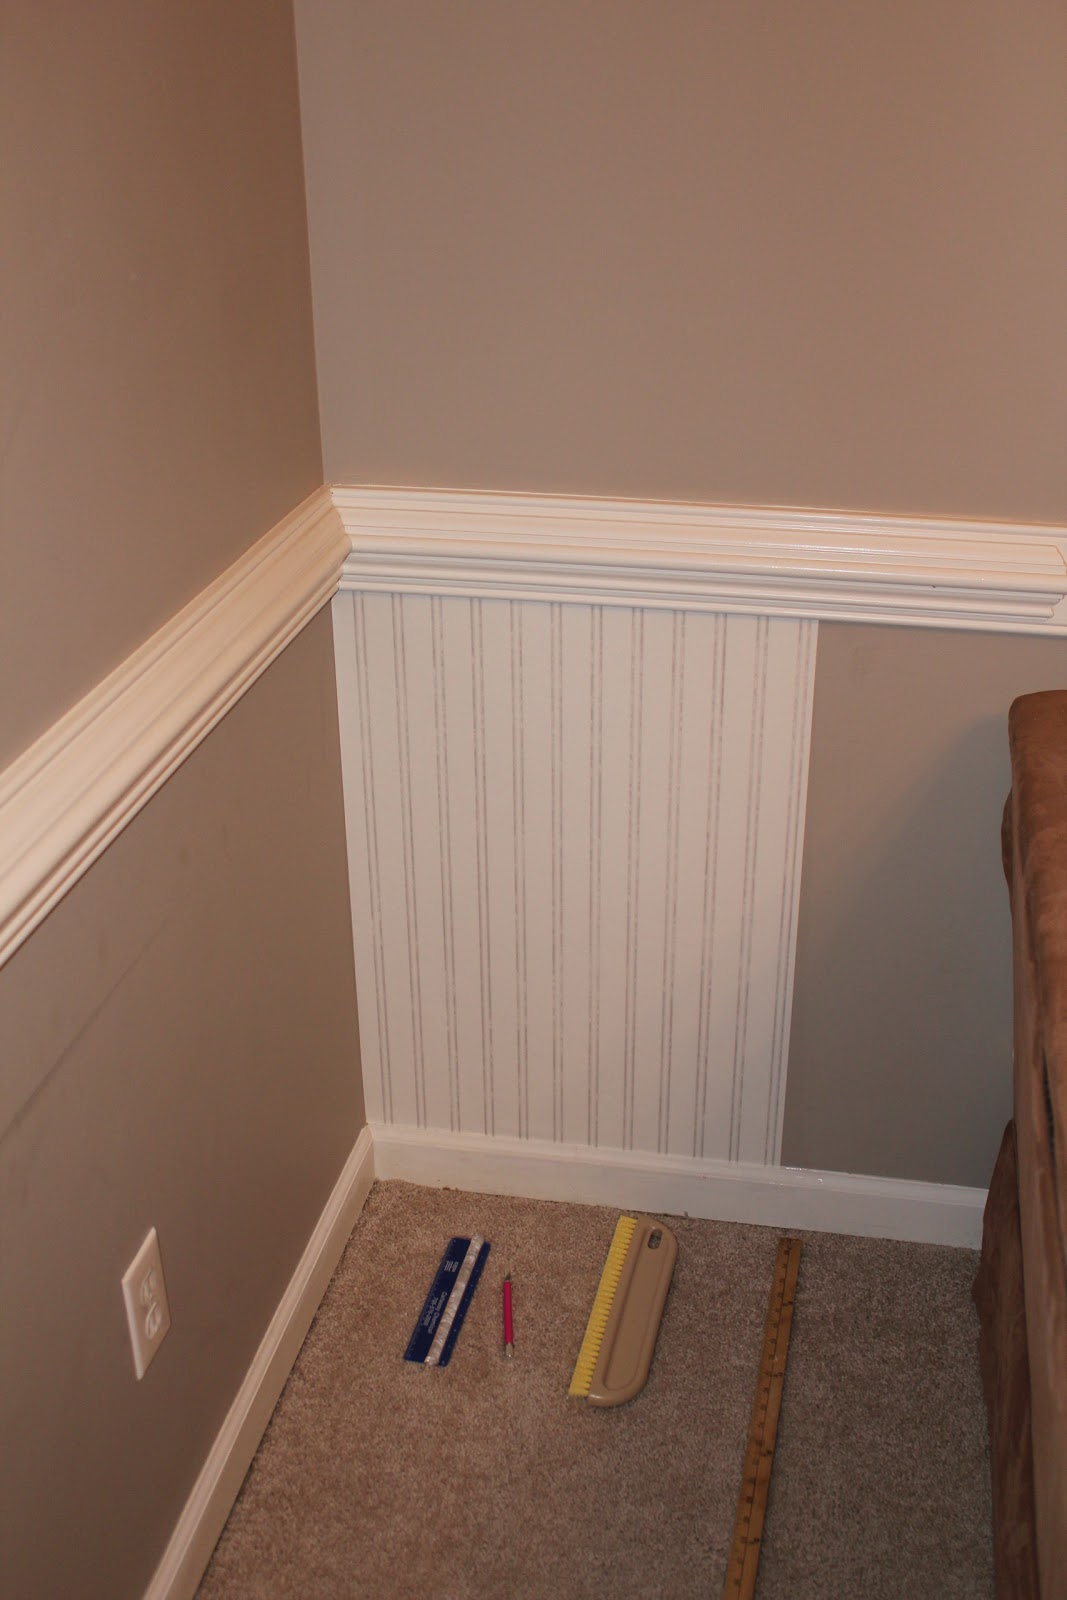 Image Of Brown Beadboard Gallant Oak Interior Wall Paneling